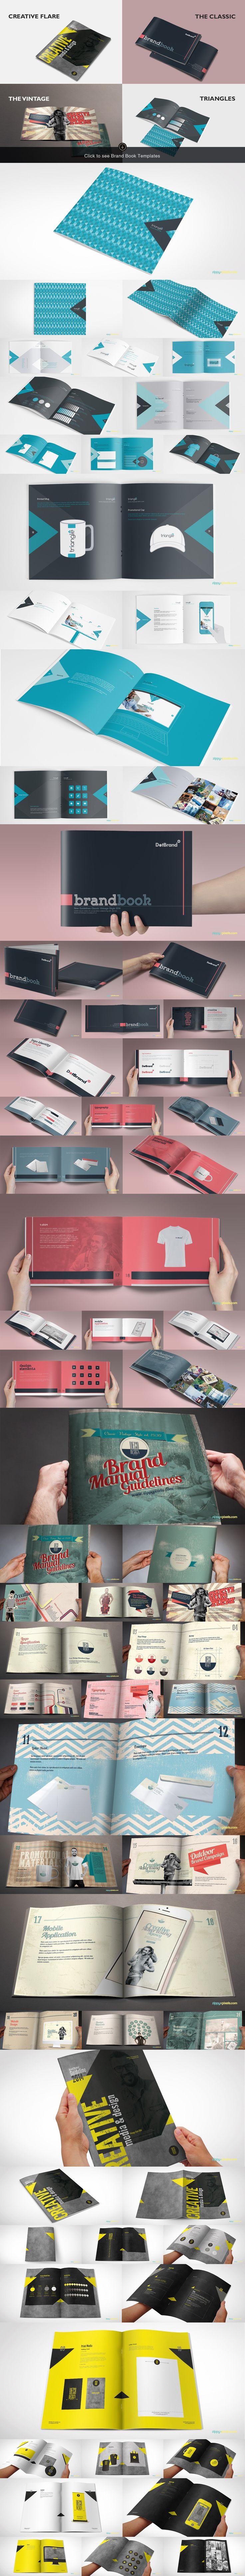 15 Brand Guidelines Templates Bundle by ZippyPixels on @creativemarket